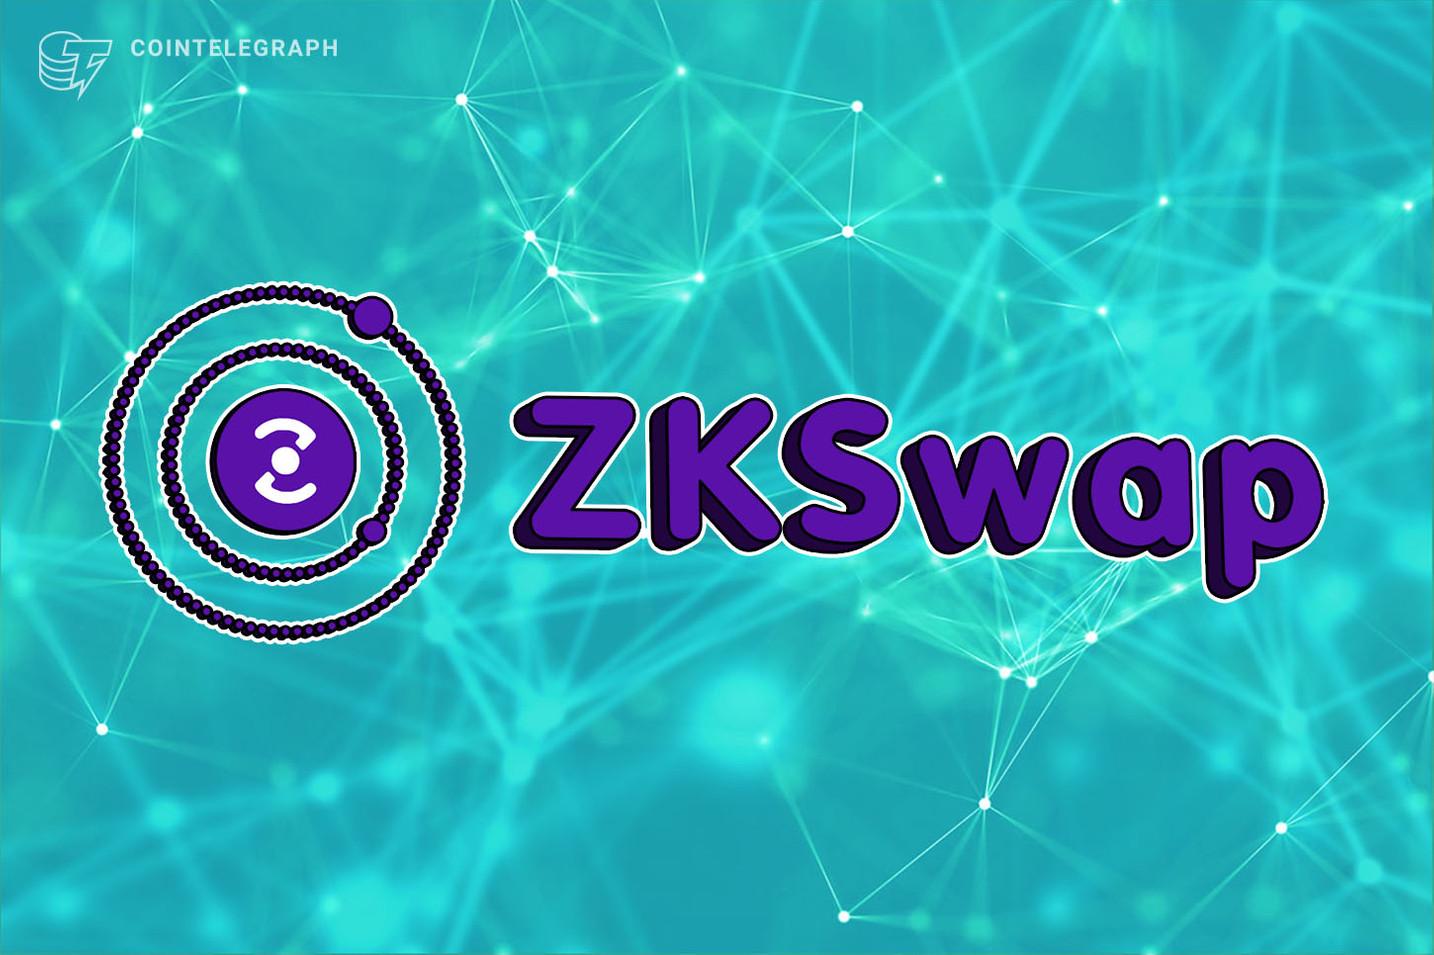 ZKSwap announces the launch of v2 mainnet, enabling unlimited token listing